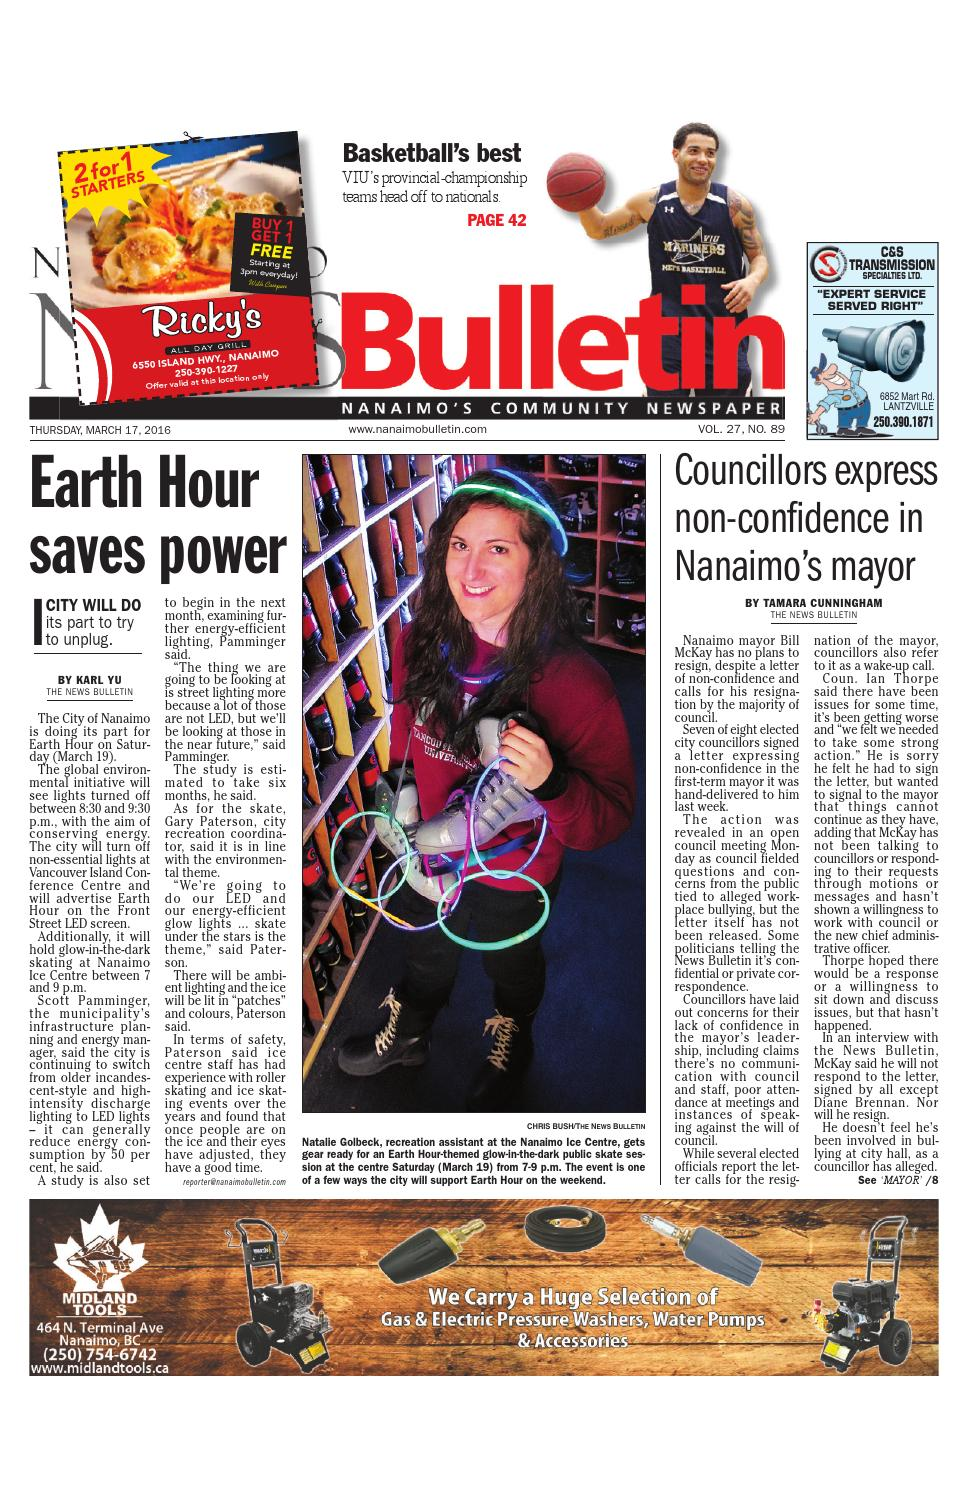 Bathmaster Nanaimo nanaimo news bulletin, march 17, 2016black press - issuu